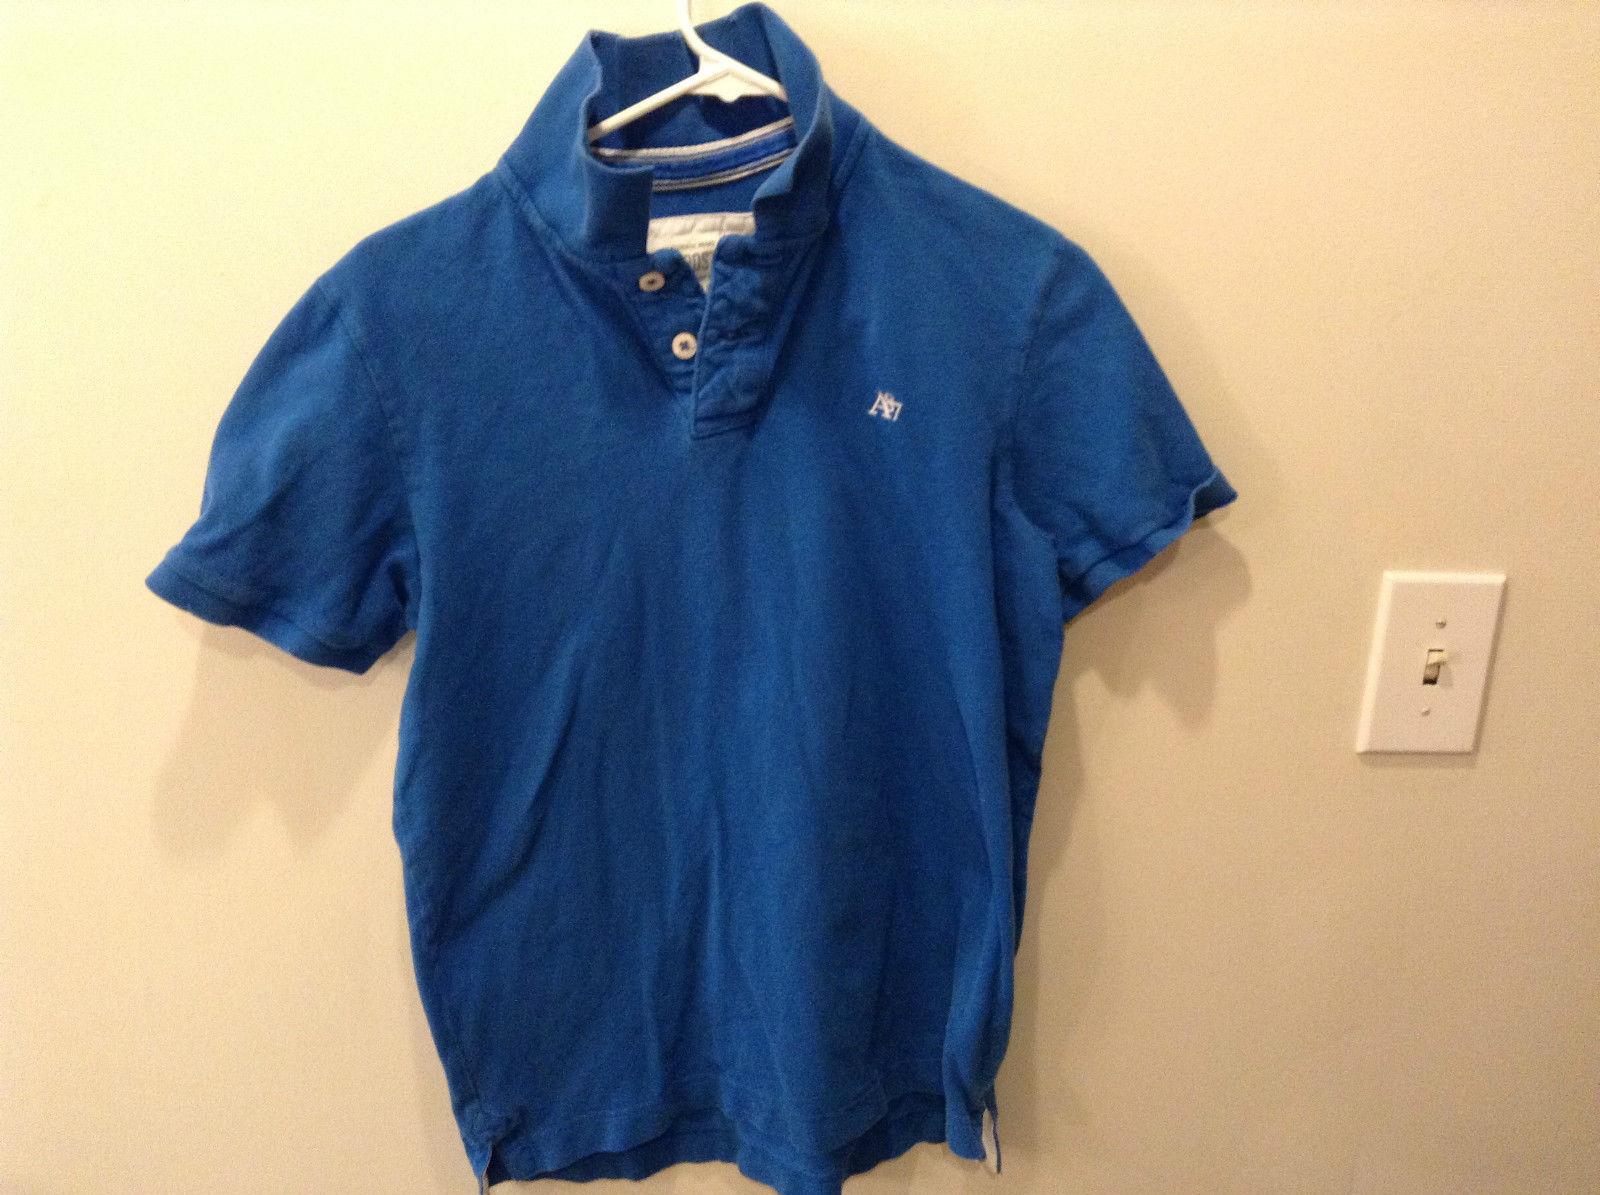 Aeropostale Short Sleeve Light Blue Polo Shirt Size Medium